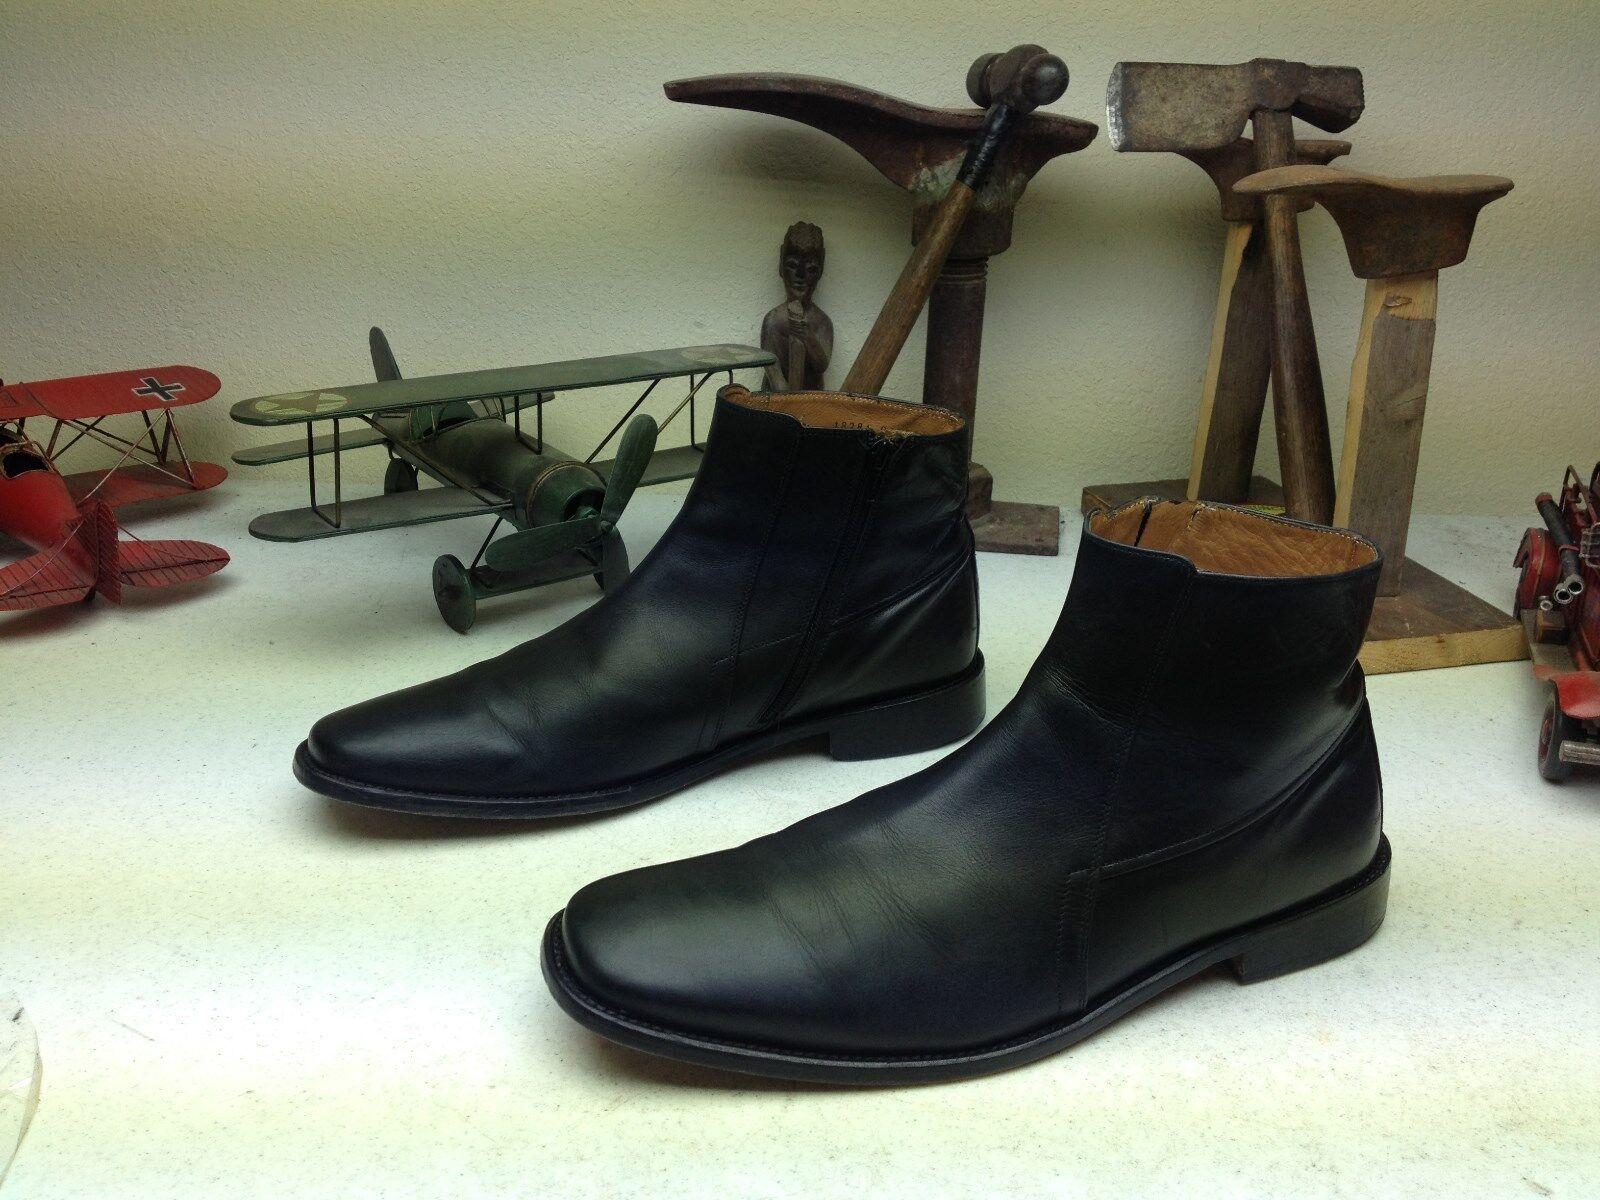 FLORSHEIM schwarz LEATHER LEATHER LEATHER ZIP UP BEATLE BOSS Stiefel Größe 11 D 26801a